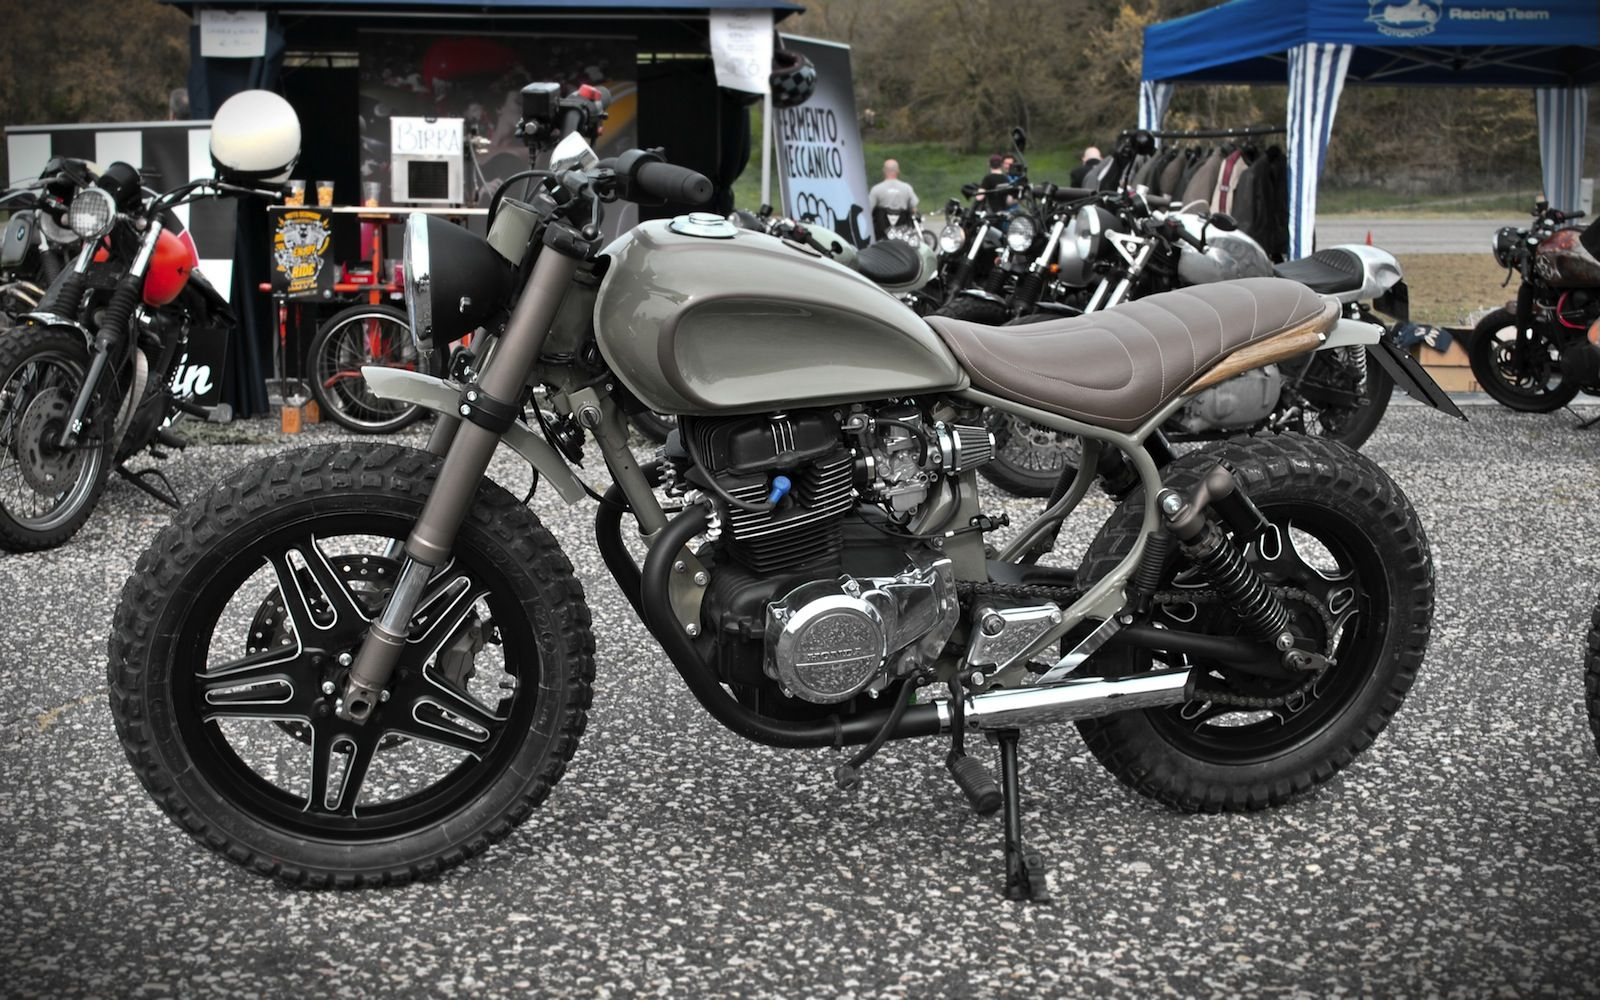 matteucci garage honda cm400 bikes pinterest motocicleta. Black Bedroom Furniture Sets. Home Design Ideas